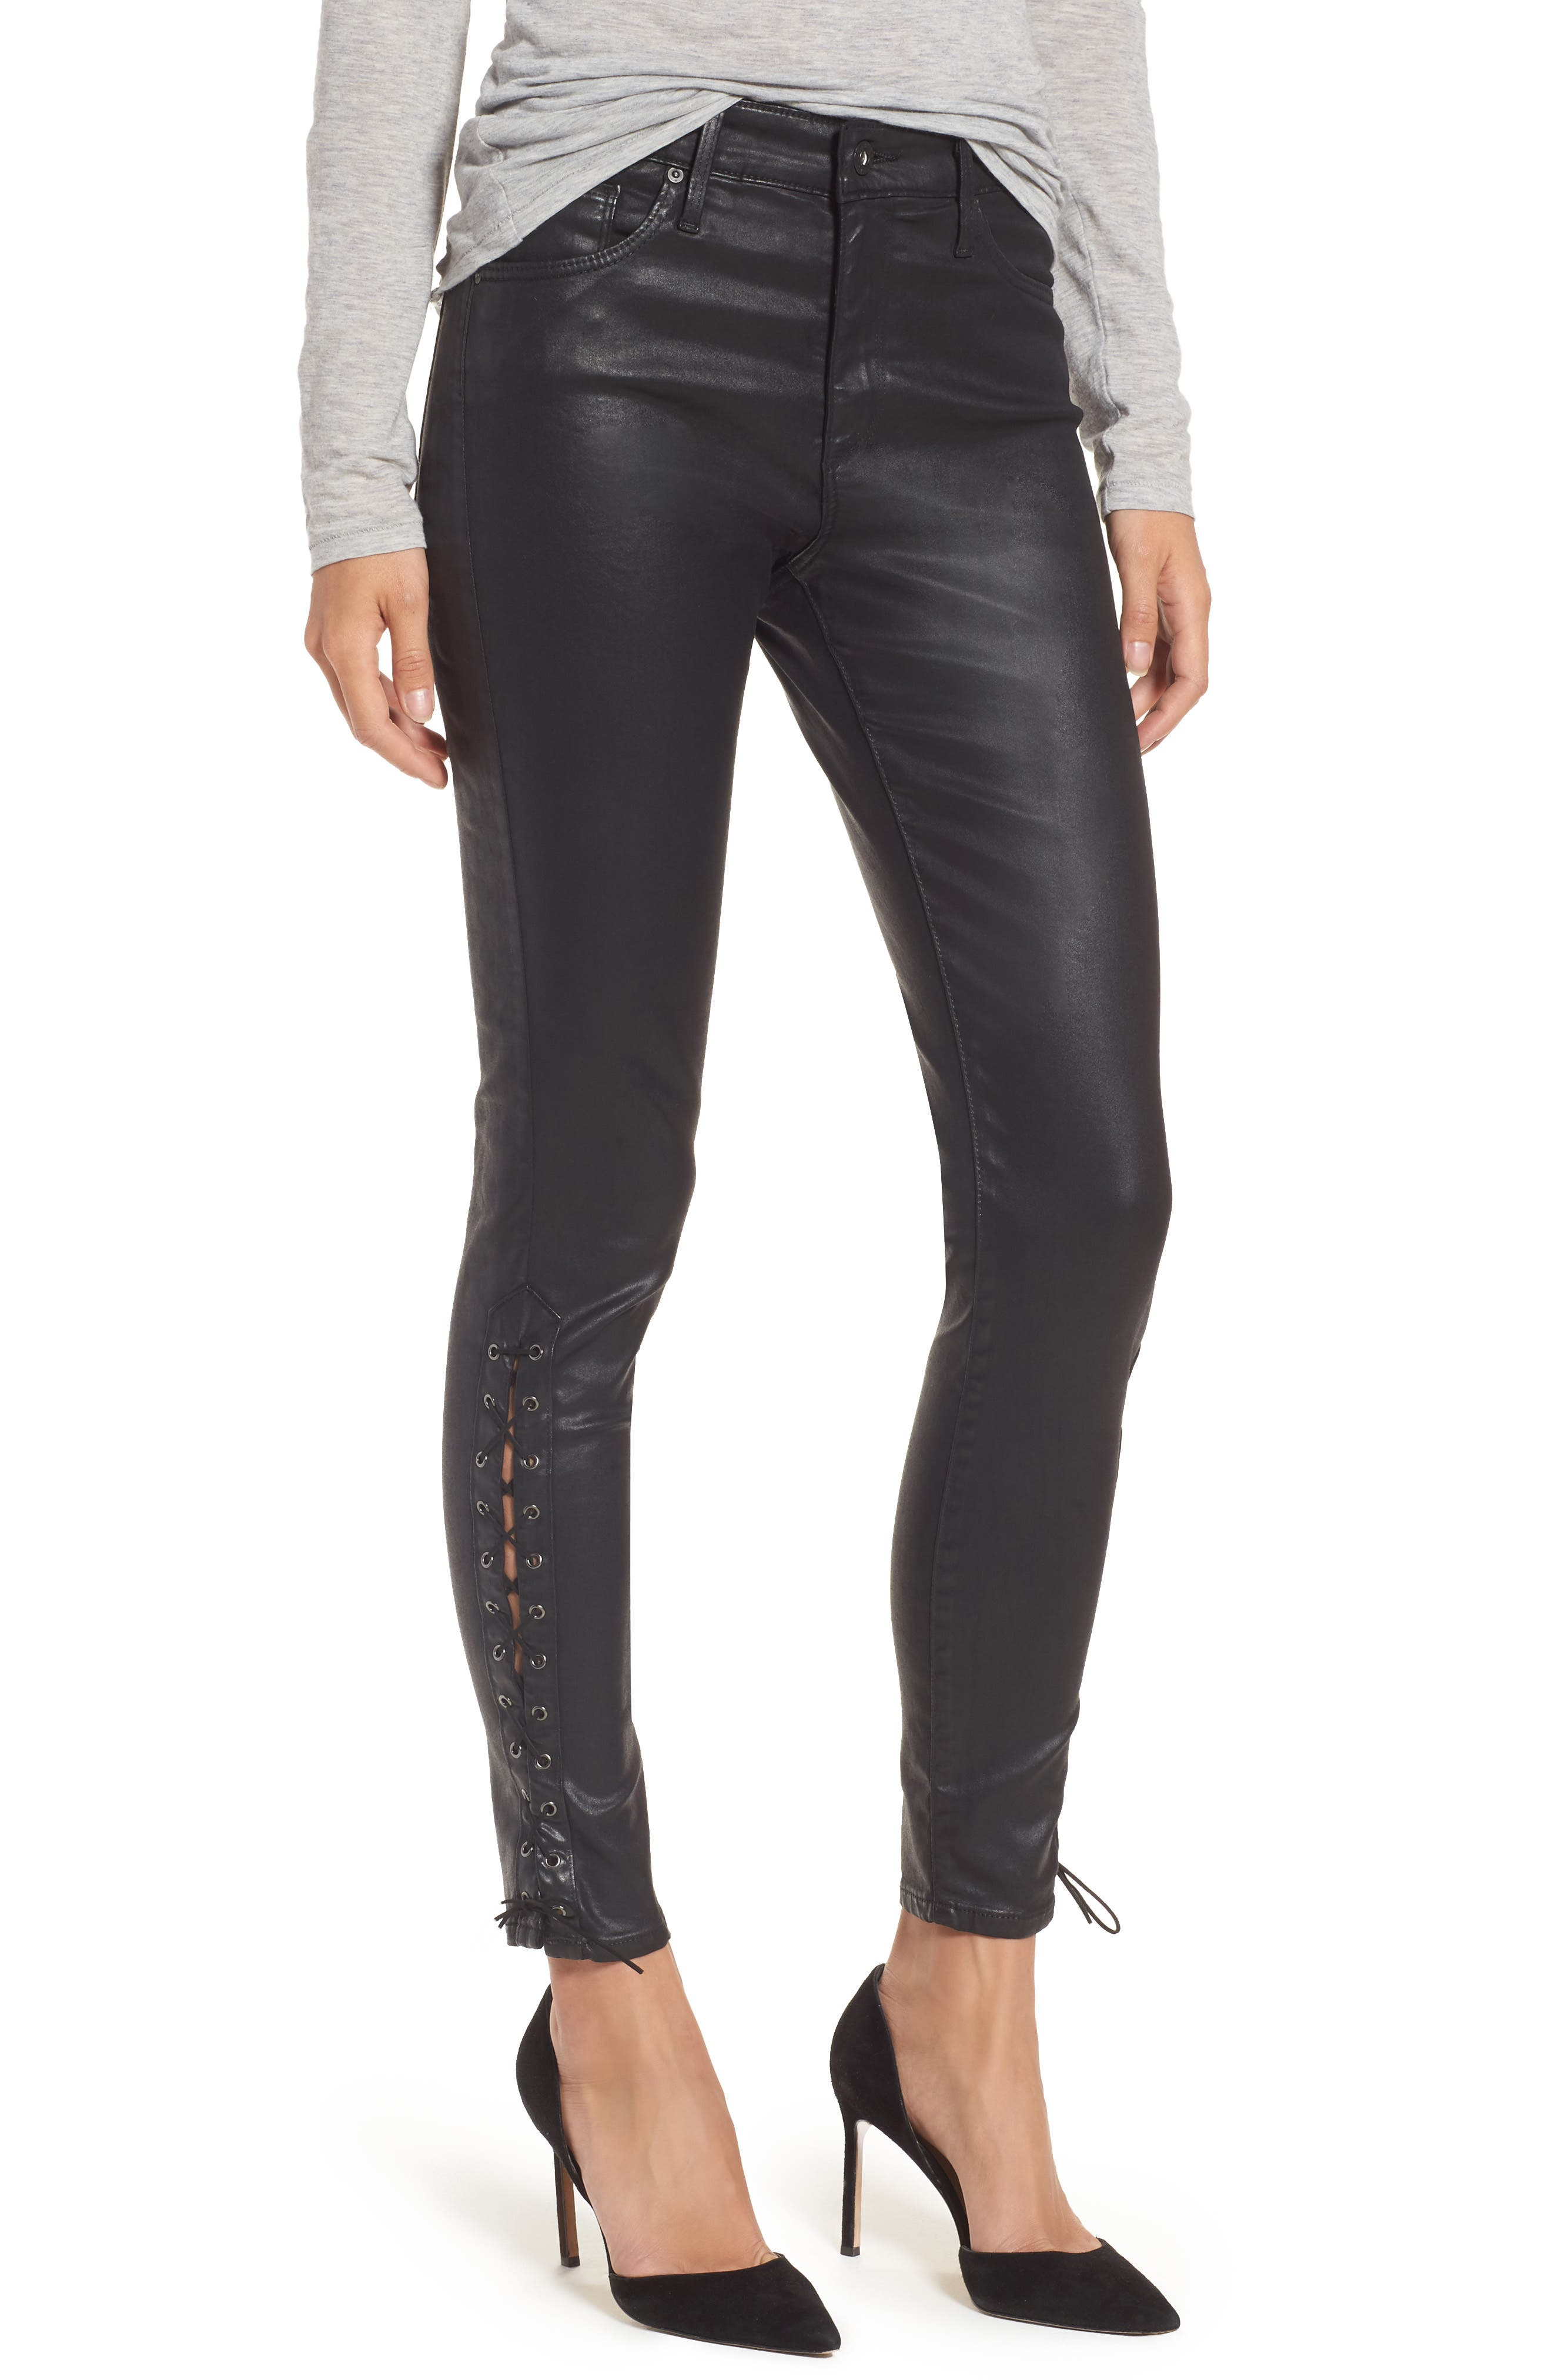 AG The Farrah High Waist Ankle Skinny Faux Leather Pants